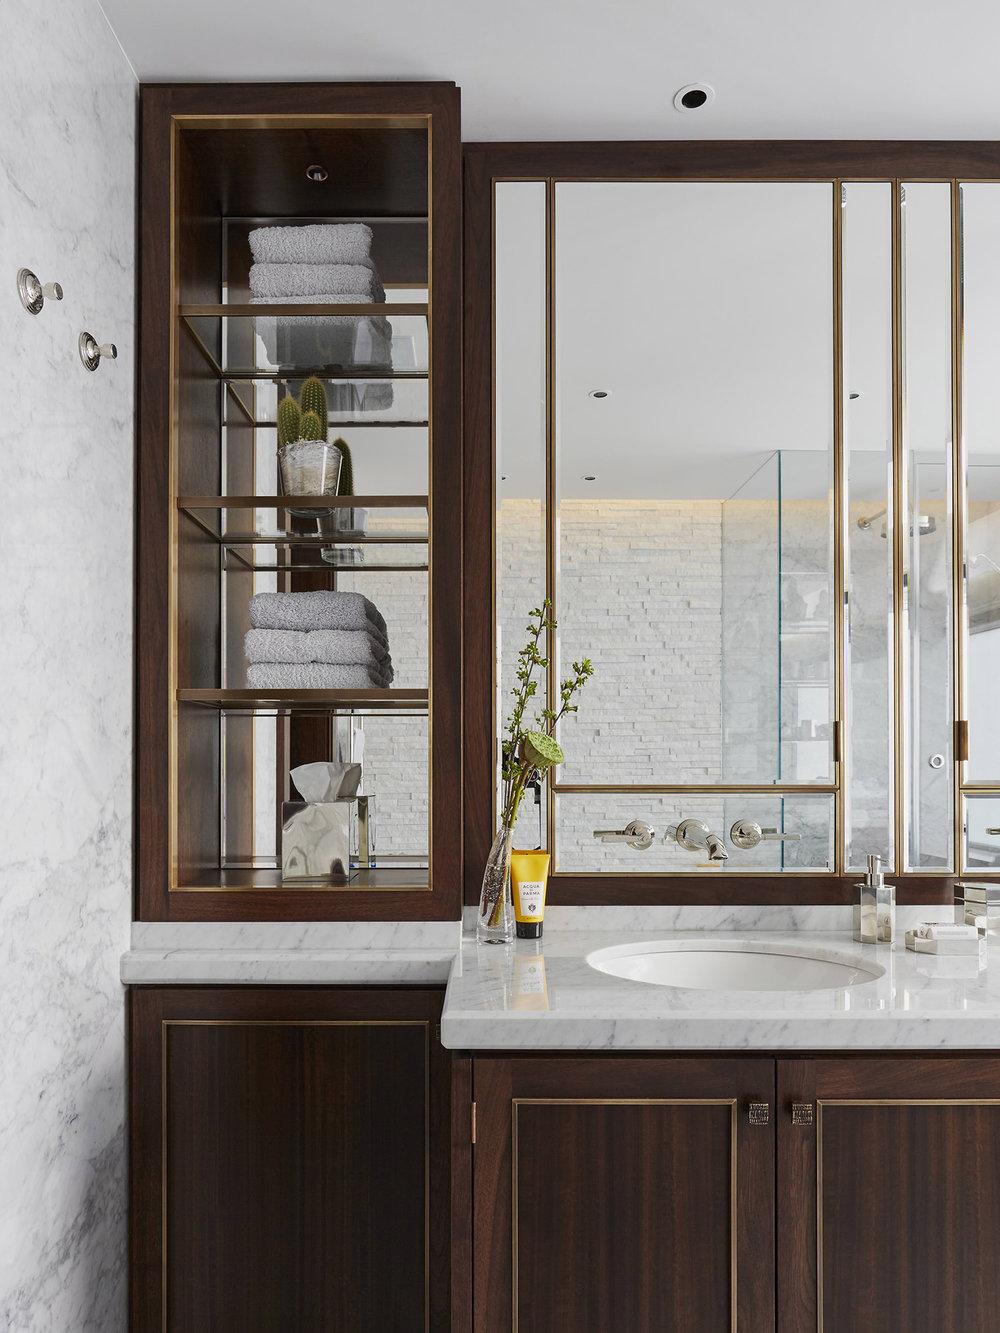 Bathroom Interior Design Bespoke Cabinets Mallet London